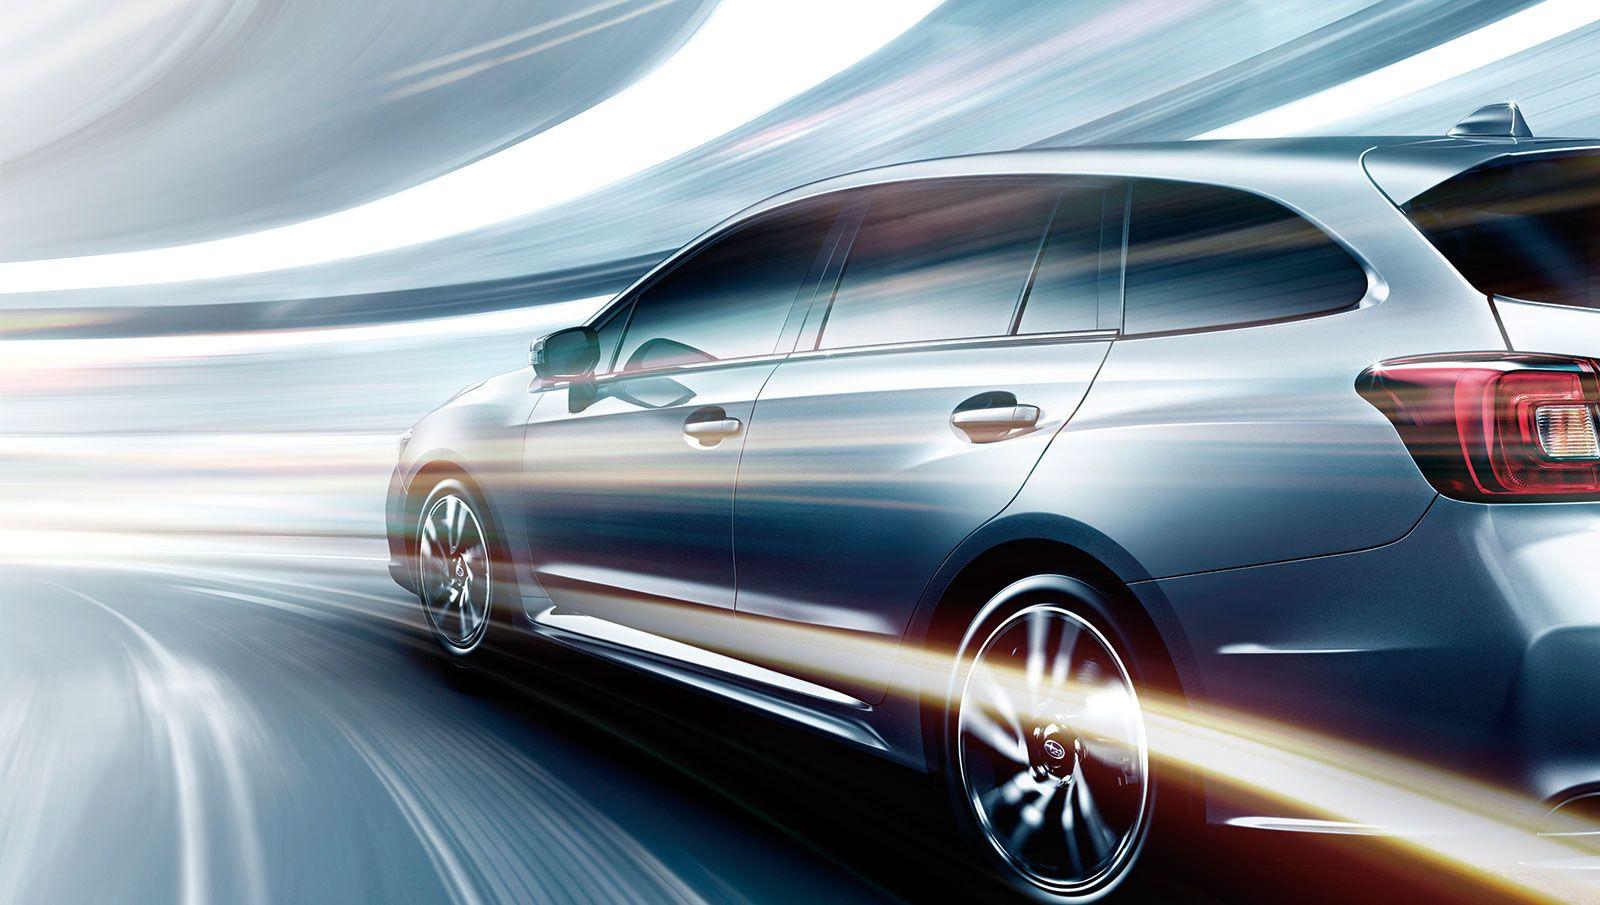 Subaru-Levorg-001.jpg